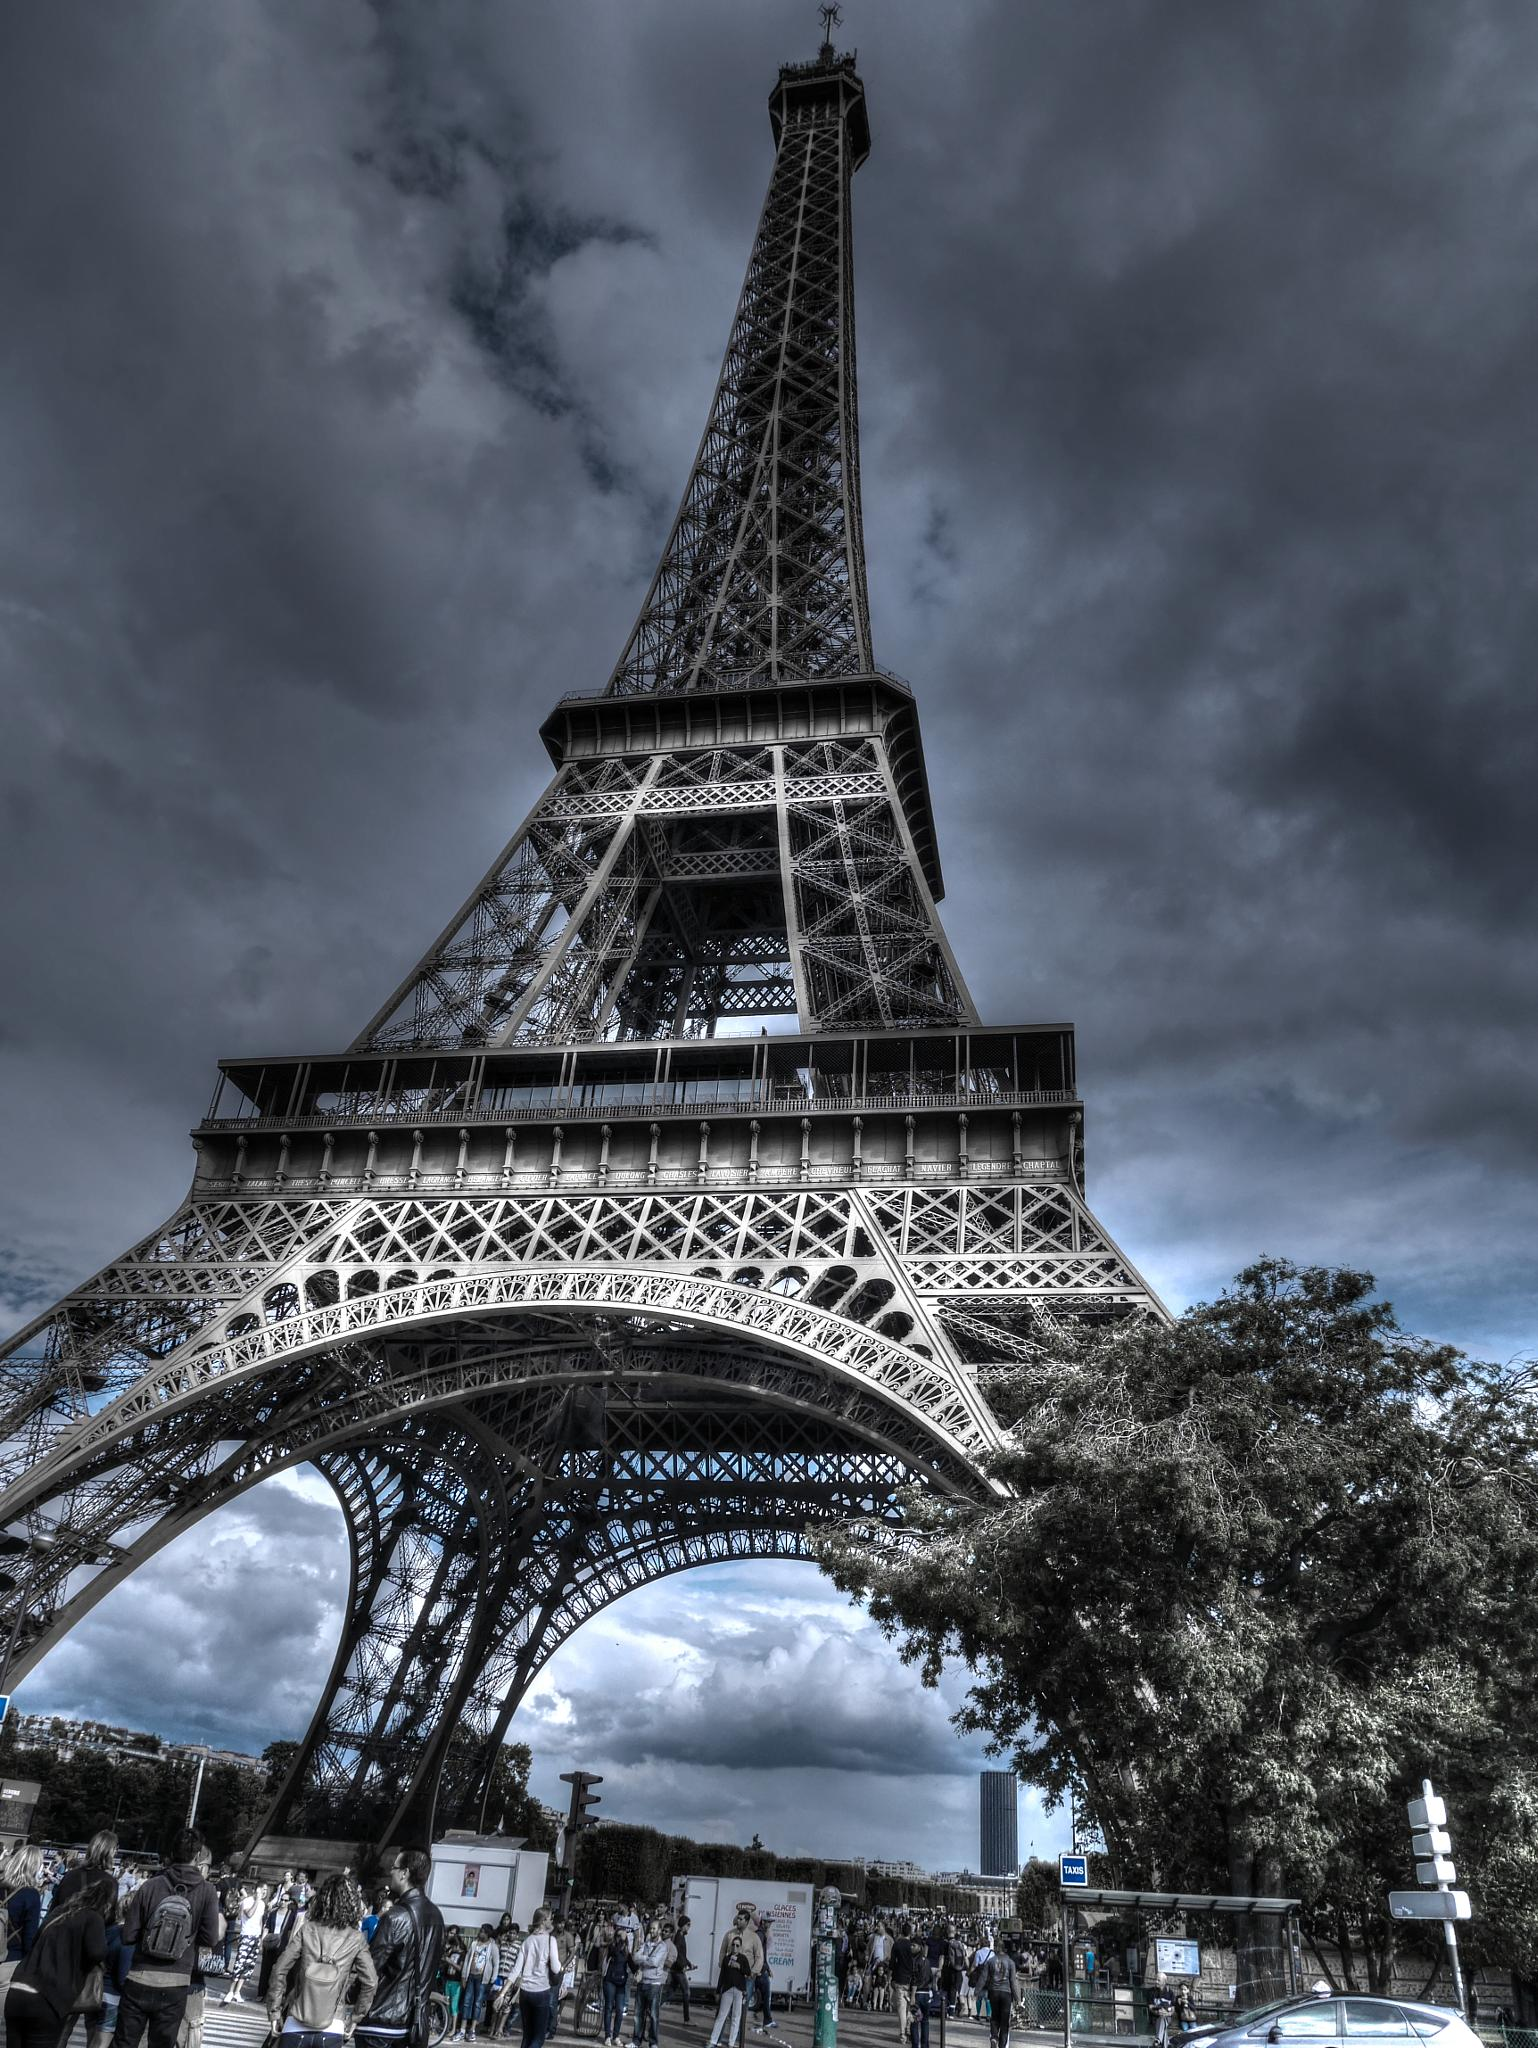 E.T. (Eiffel Tower) by Jean No